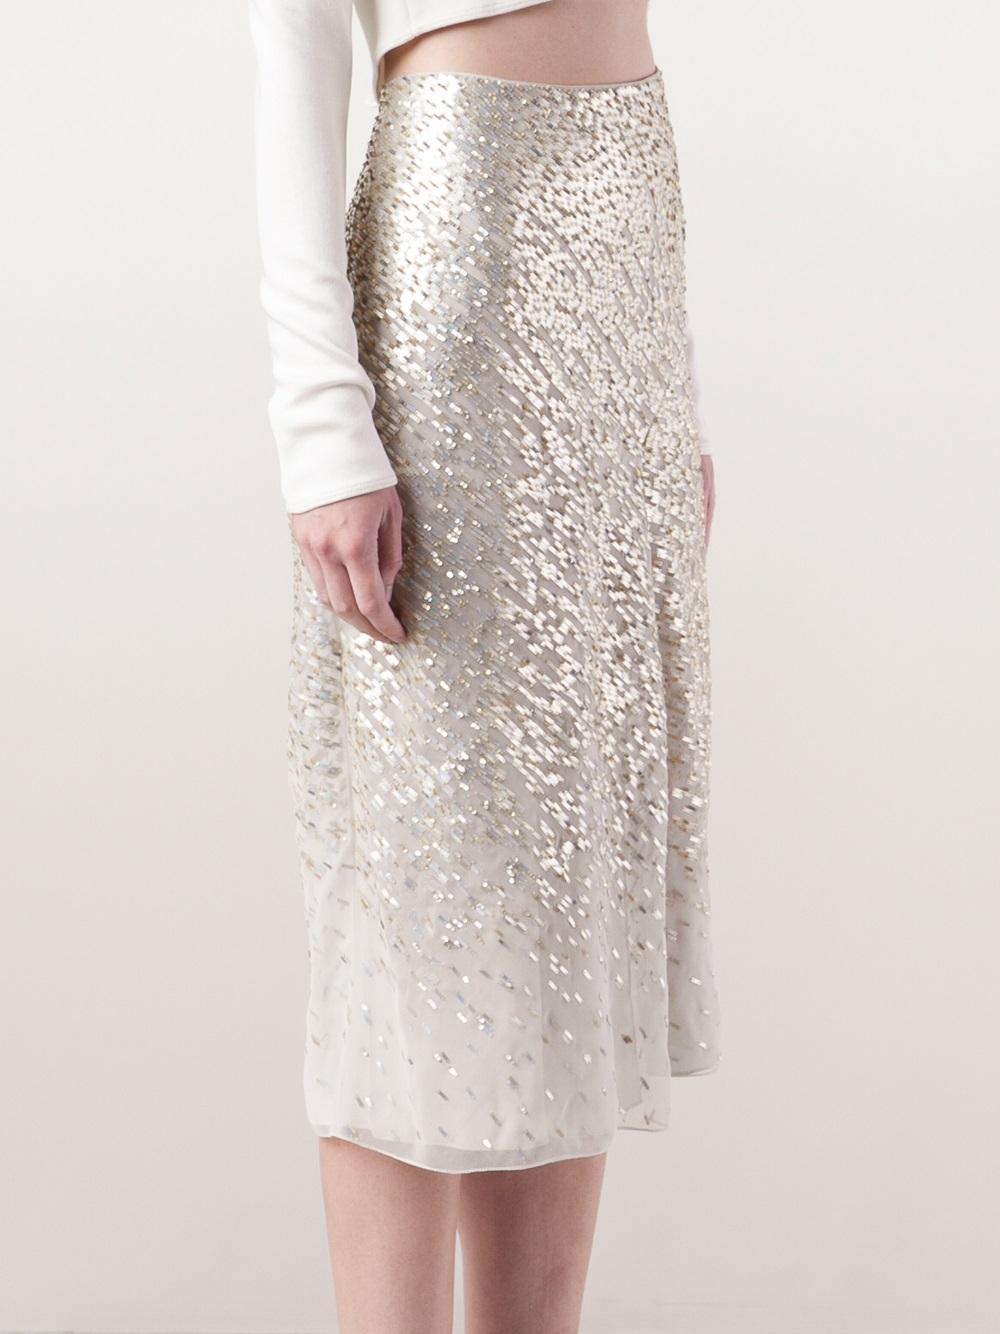 Jason wu Gradient Sequin Skirt in White | Lyst